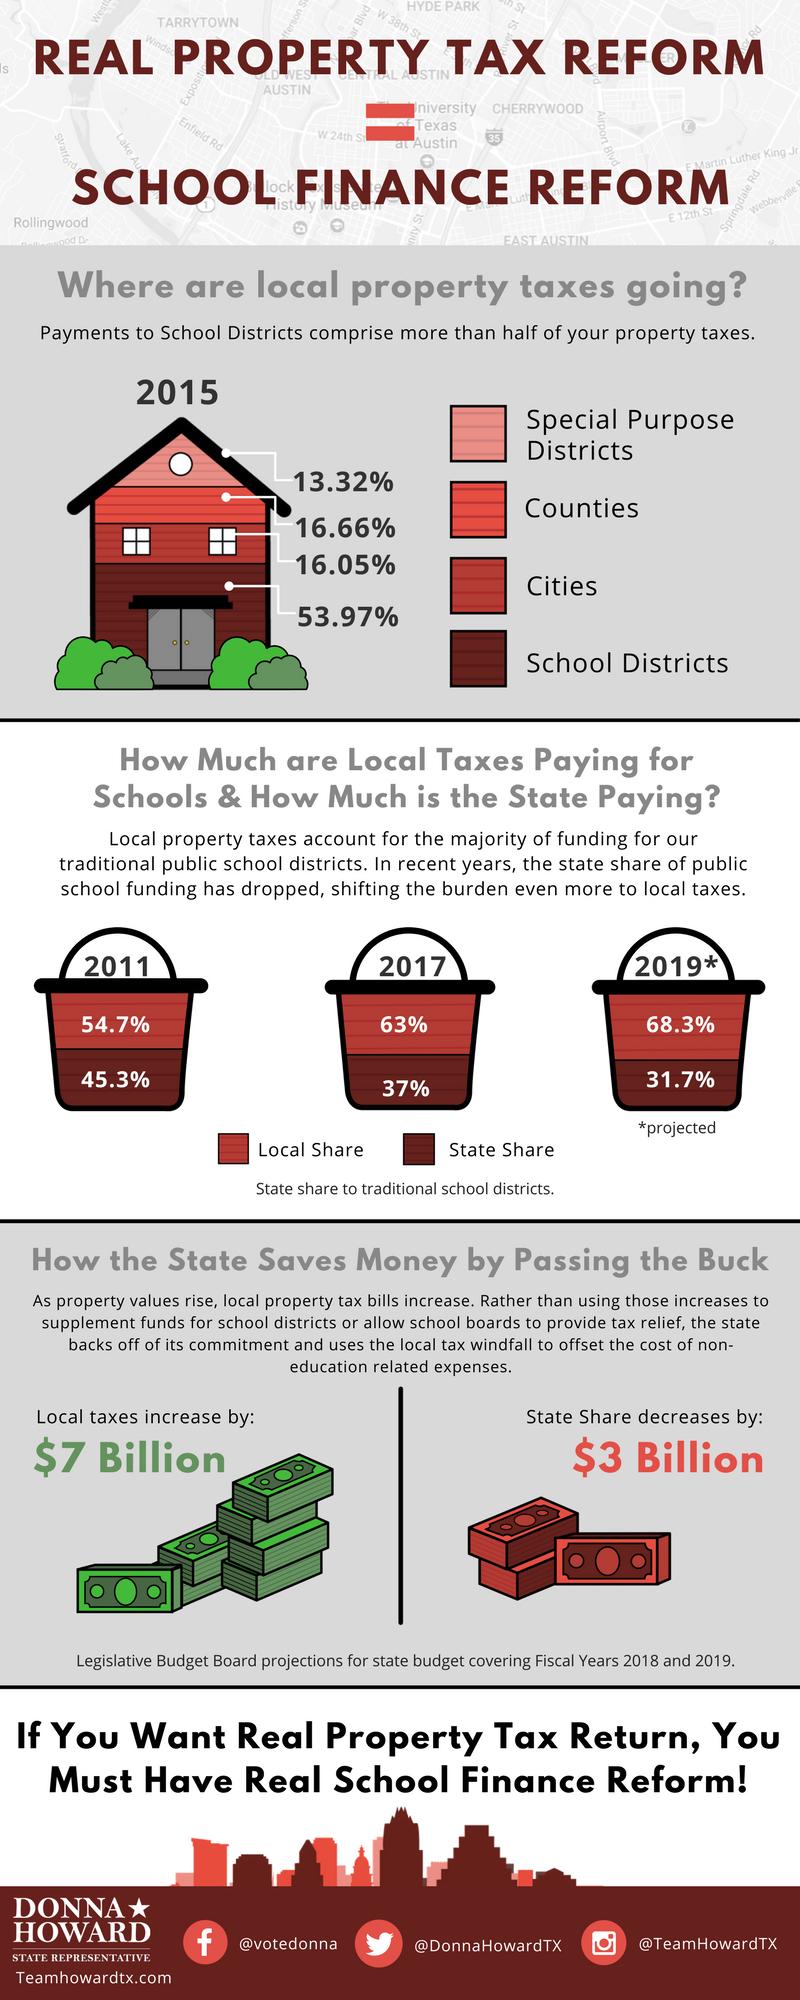 Real Property Tax Reform Equals School Finance Reform